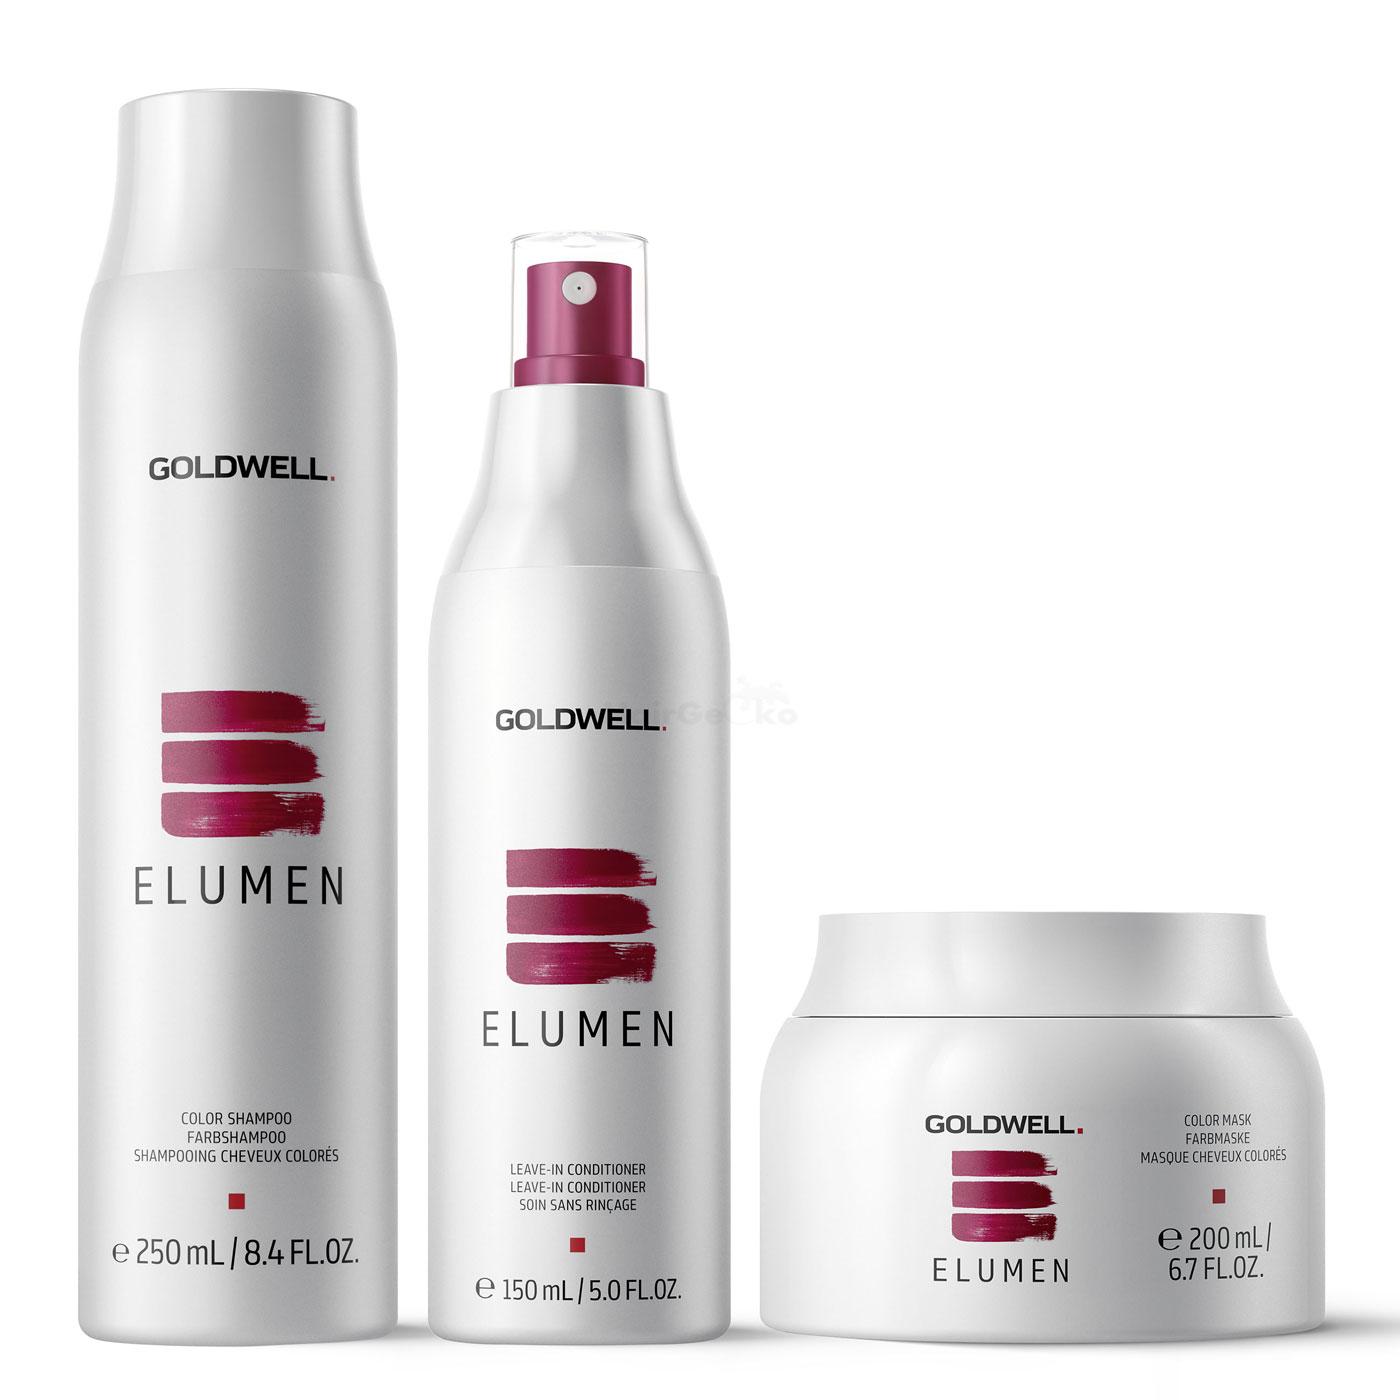 Goldwell Elumen Care Set - Shampoo Farbshampoo 250ml + Leave-In Conditioner 150ml + Mask Farbmaske 200ml